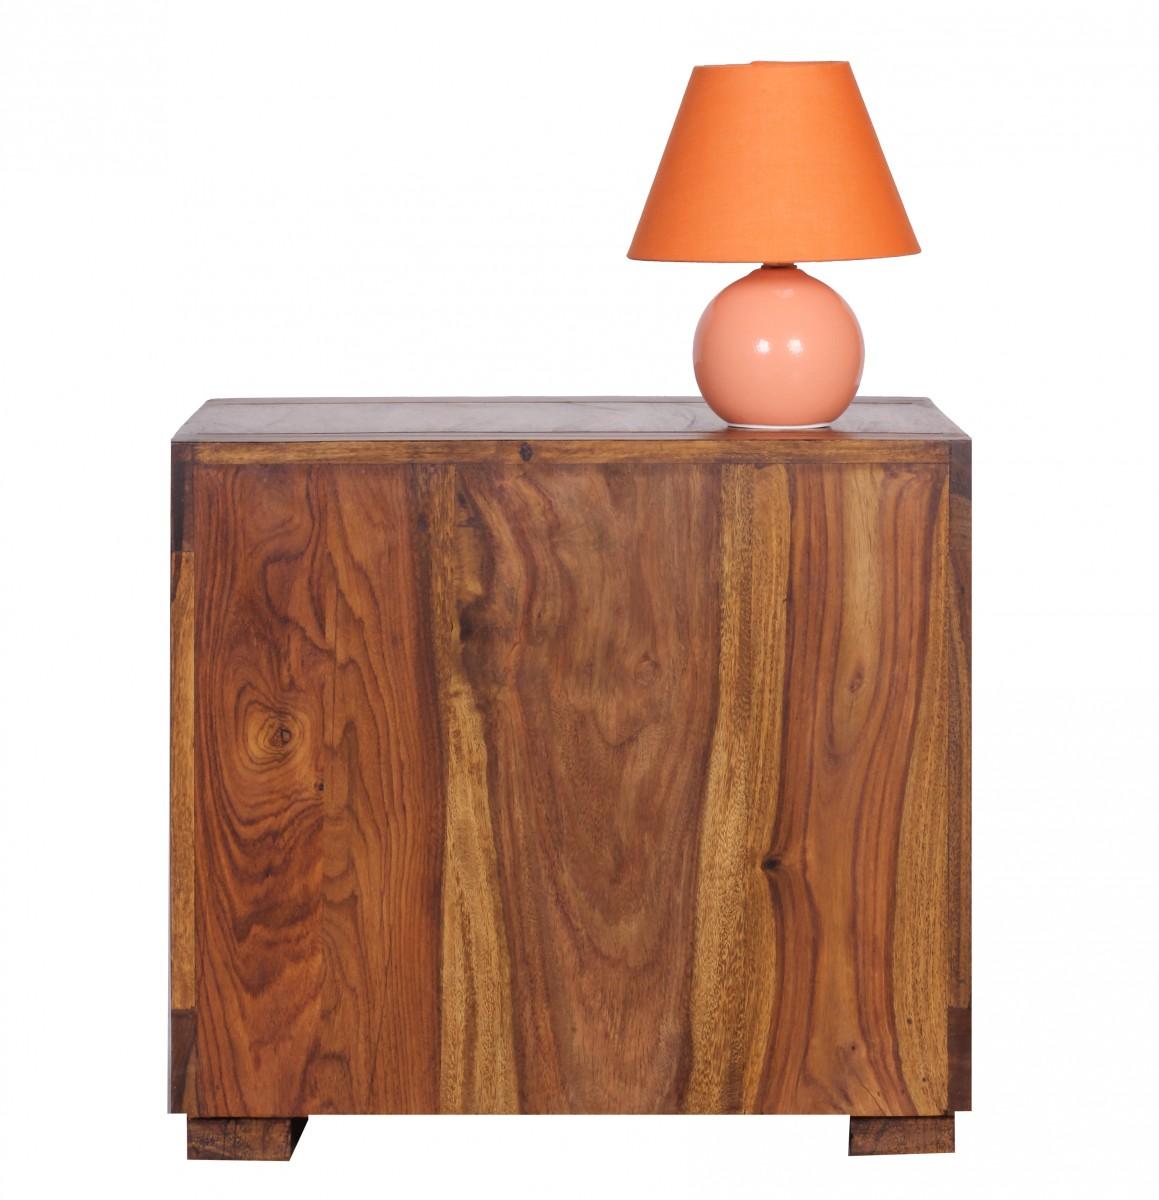 wohnling sheesham mesa de centro tresillo auxiliar madera maciza 50x50 cm nuevo ebay. Black Bedroom Furniture Sets. Home Design Ideas